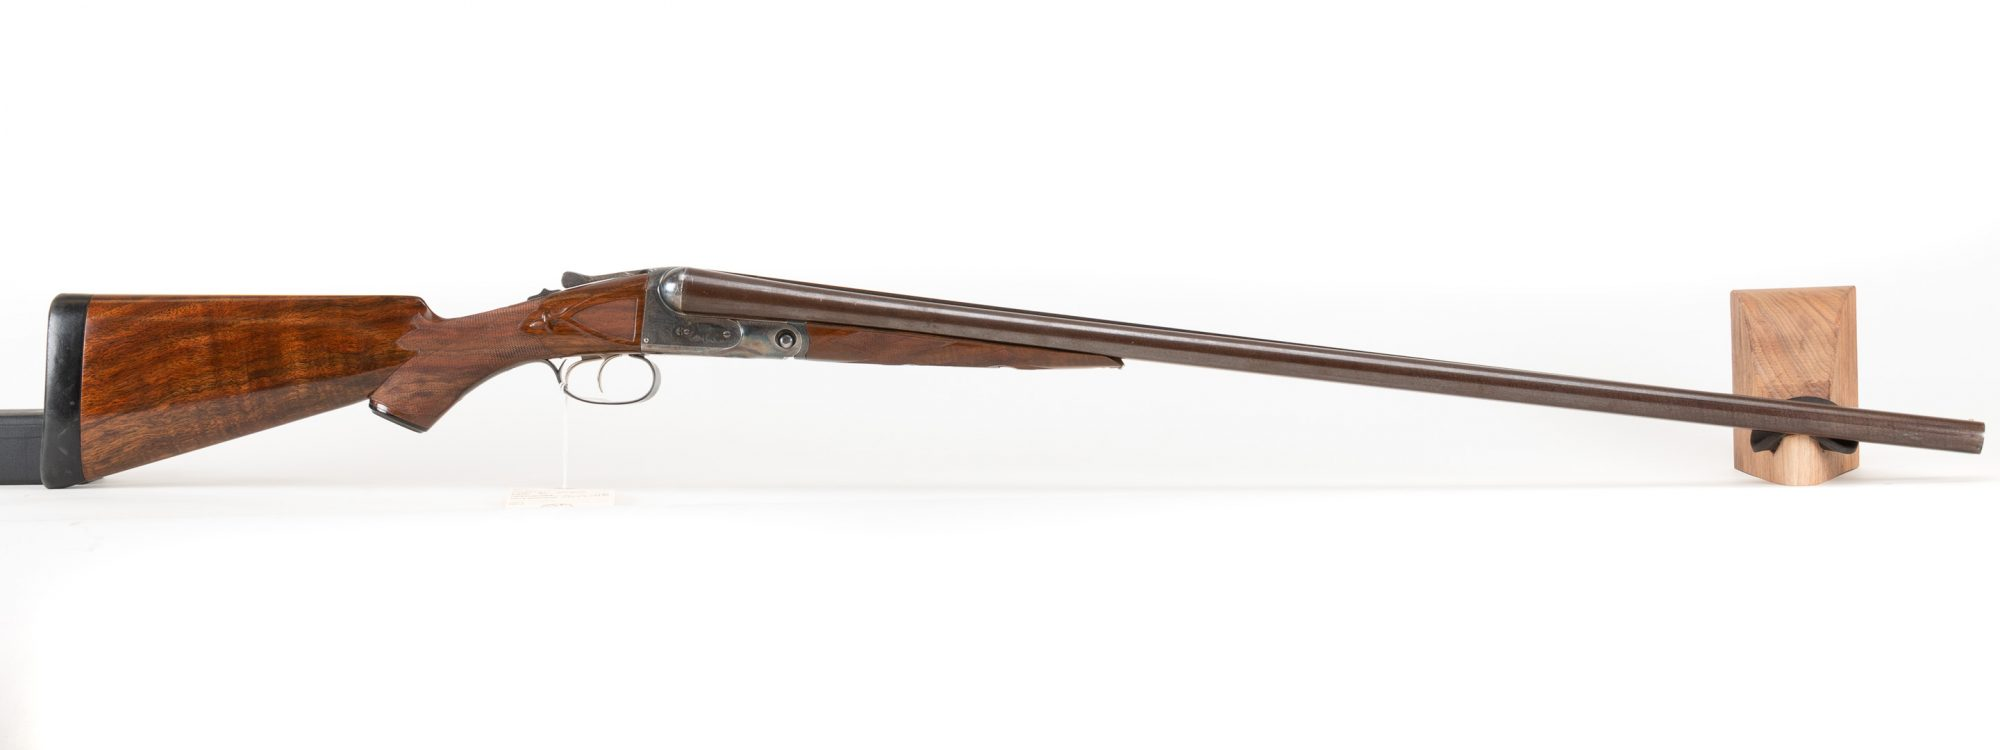 Photo of used Parker BH 12 gauge shotgun